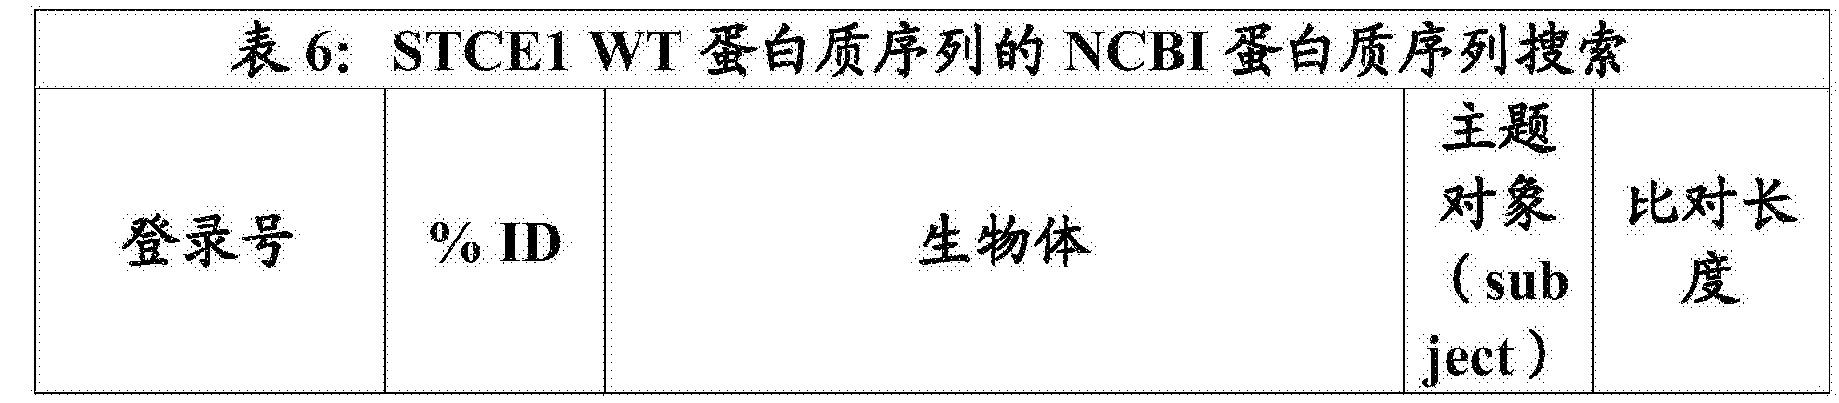 Figure CN108699543AD00352